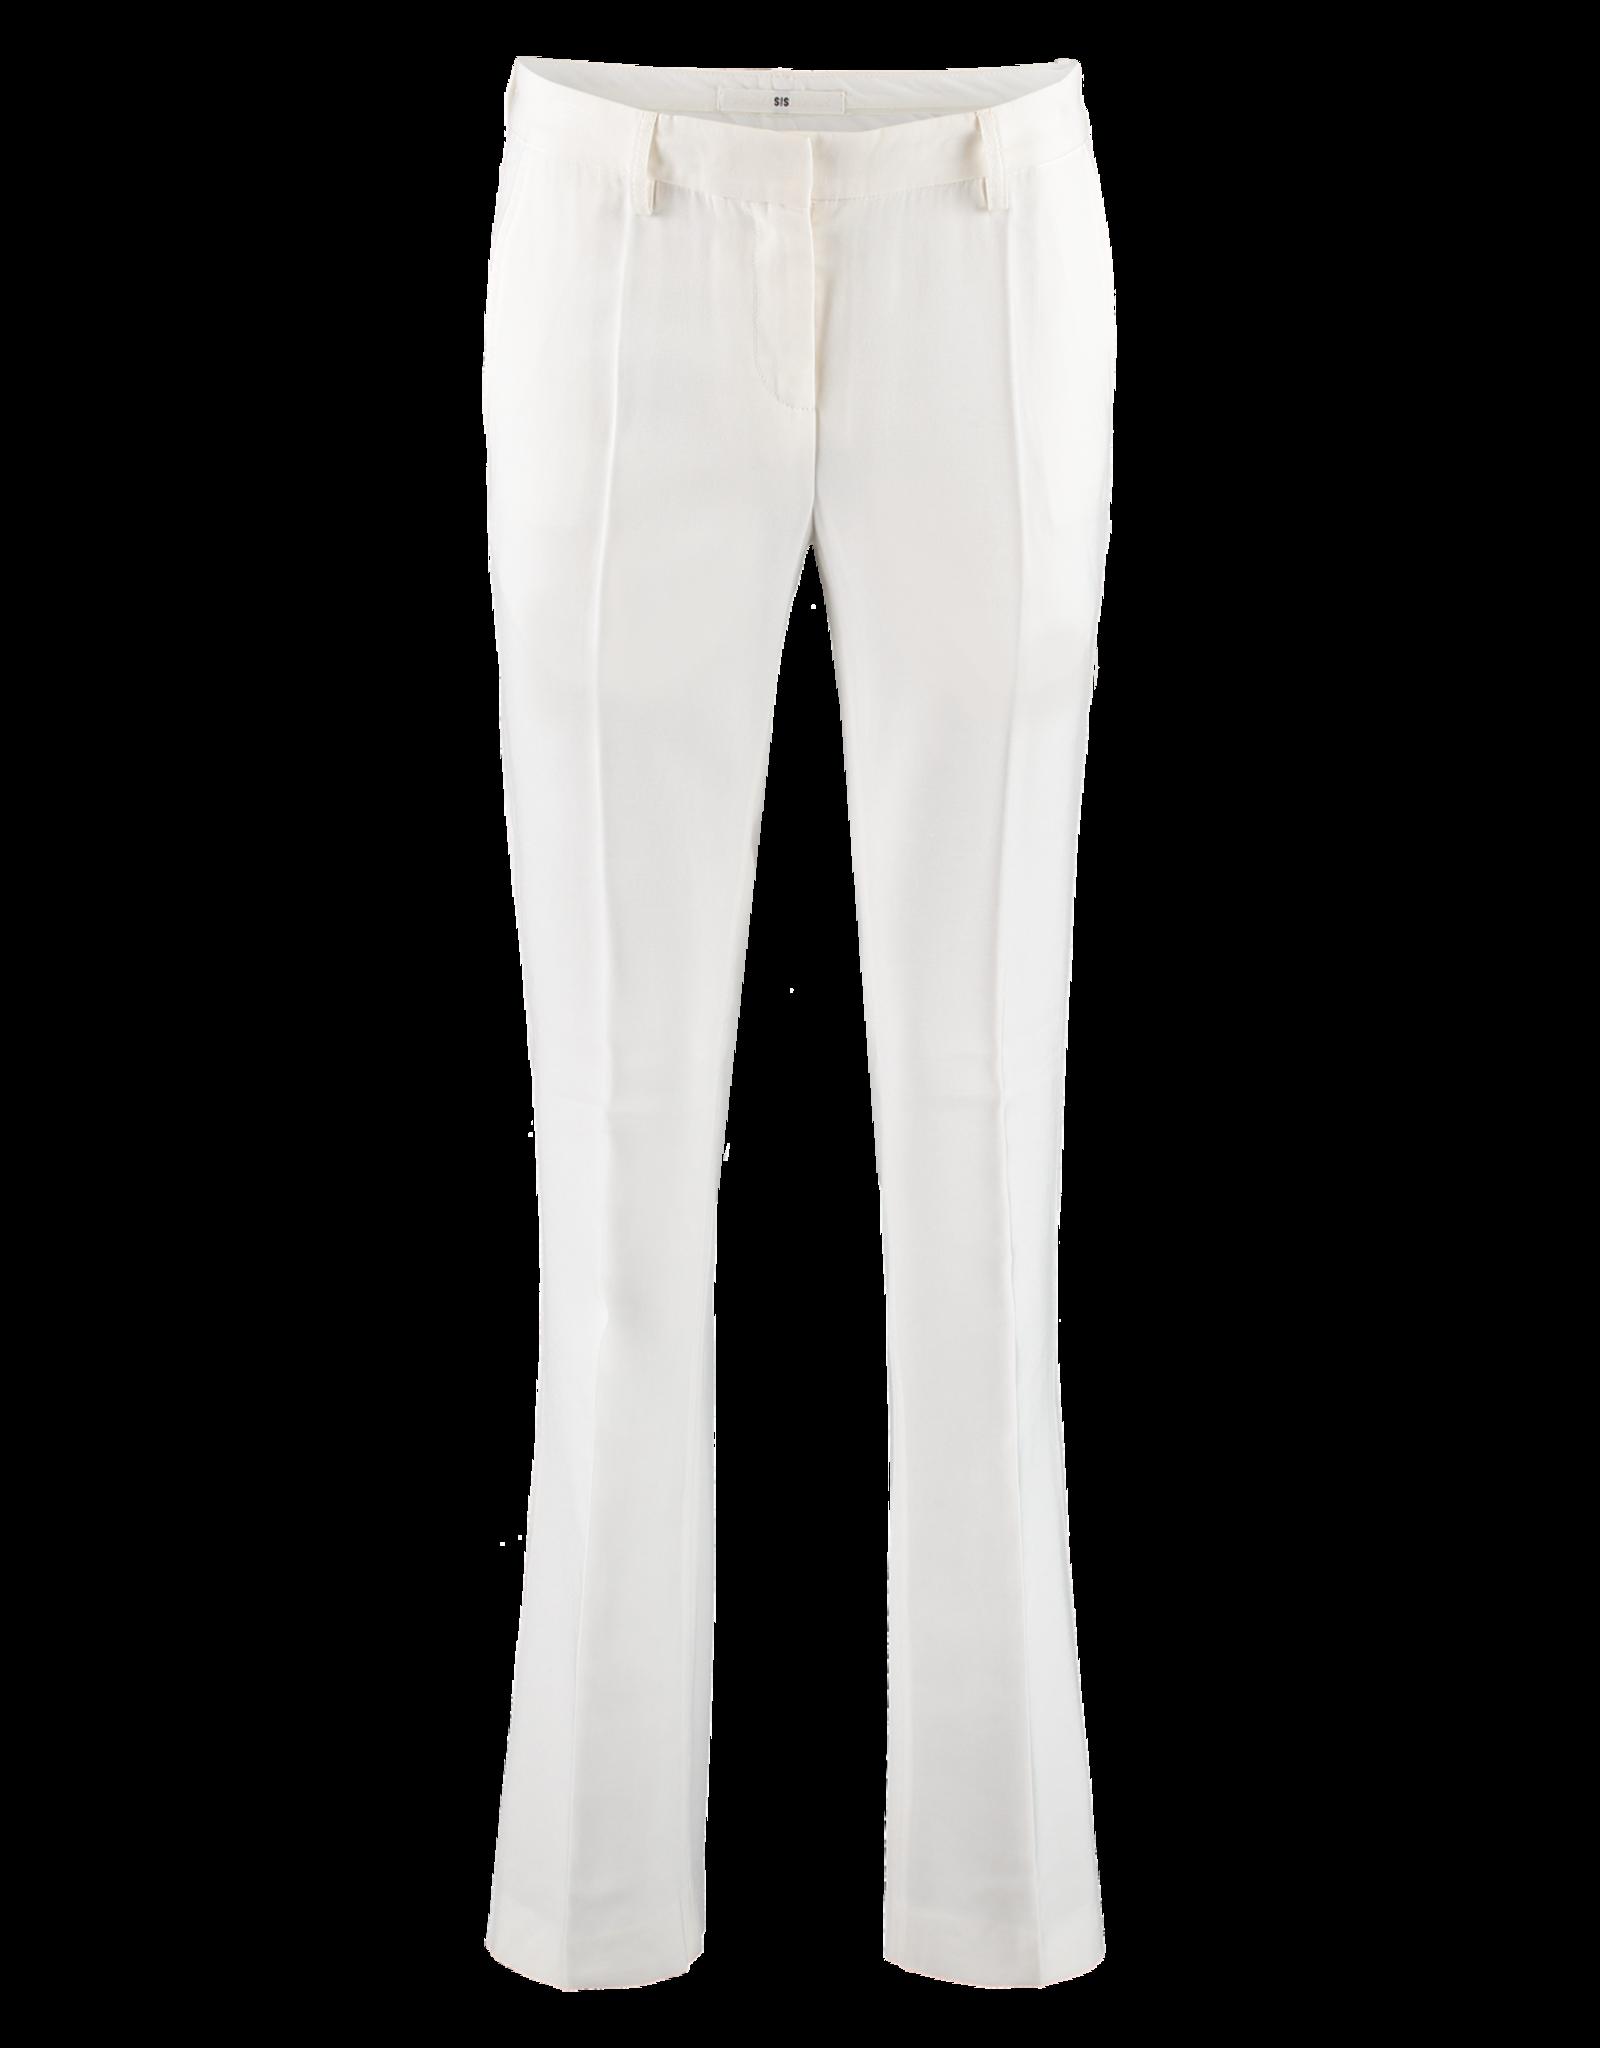 SS19 206-AL Long Flair Pants